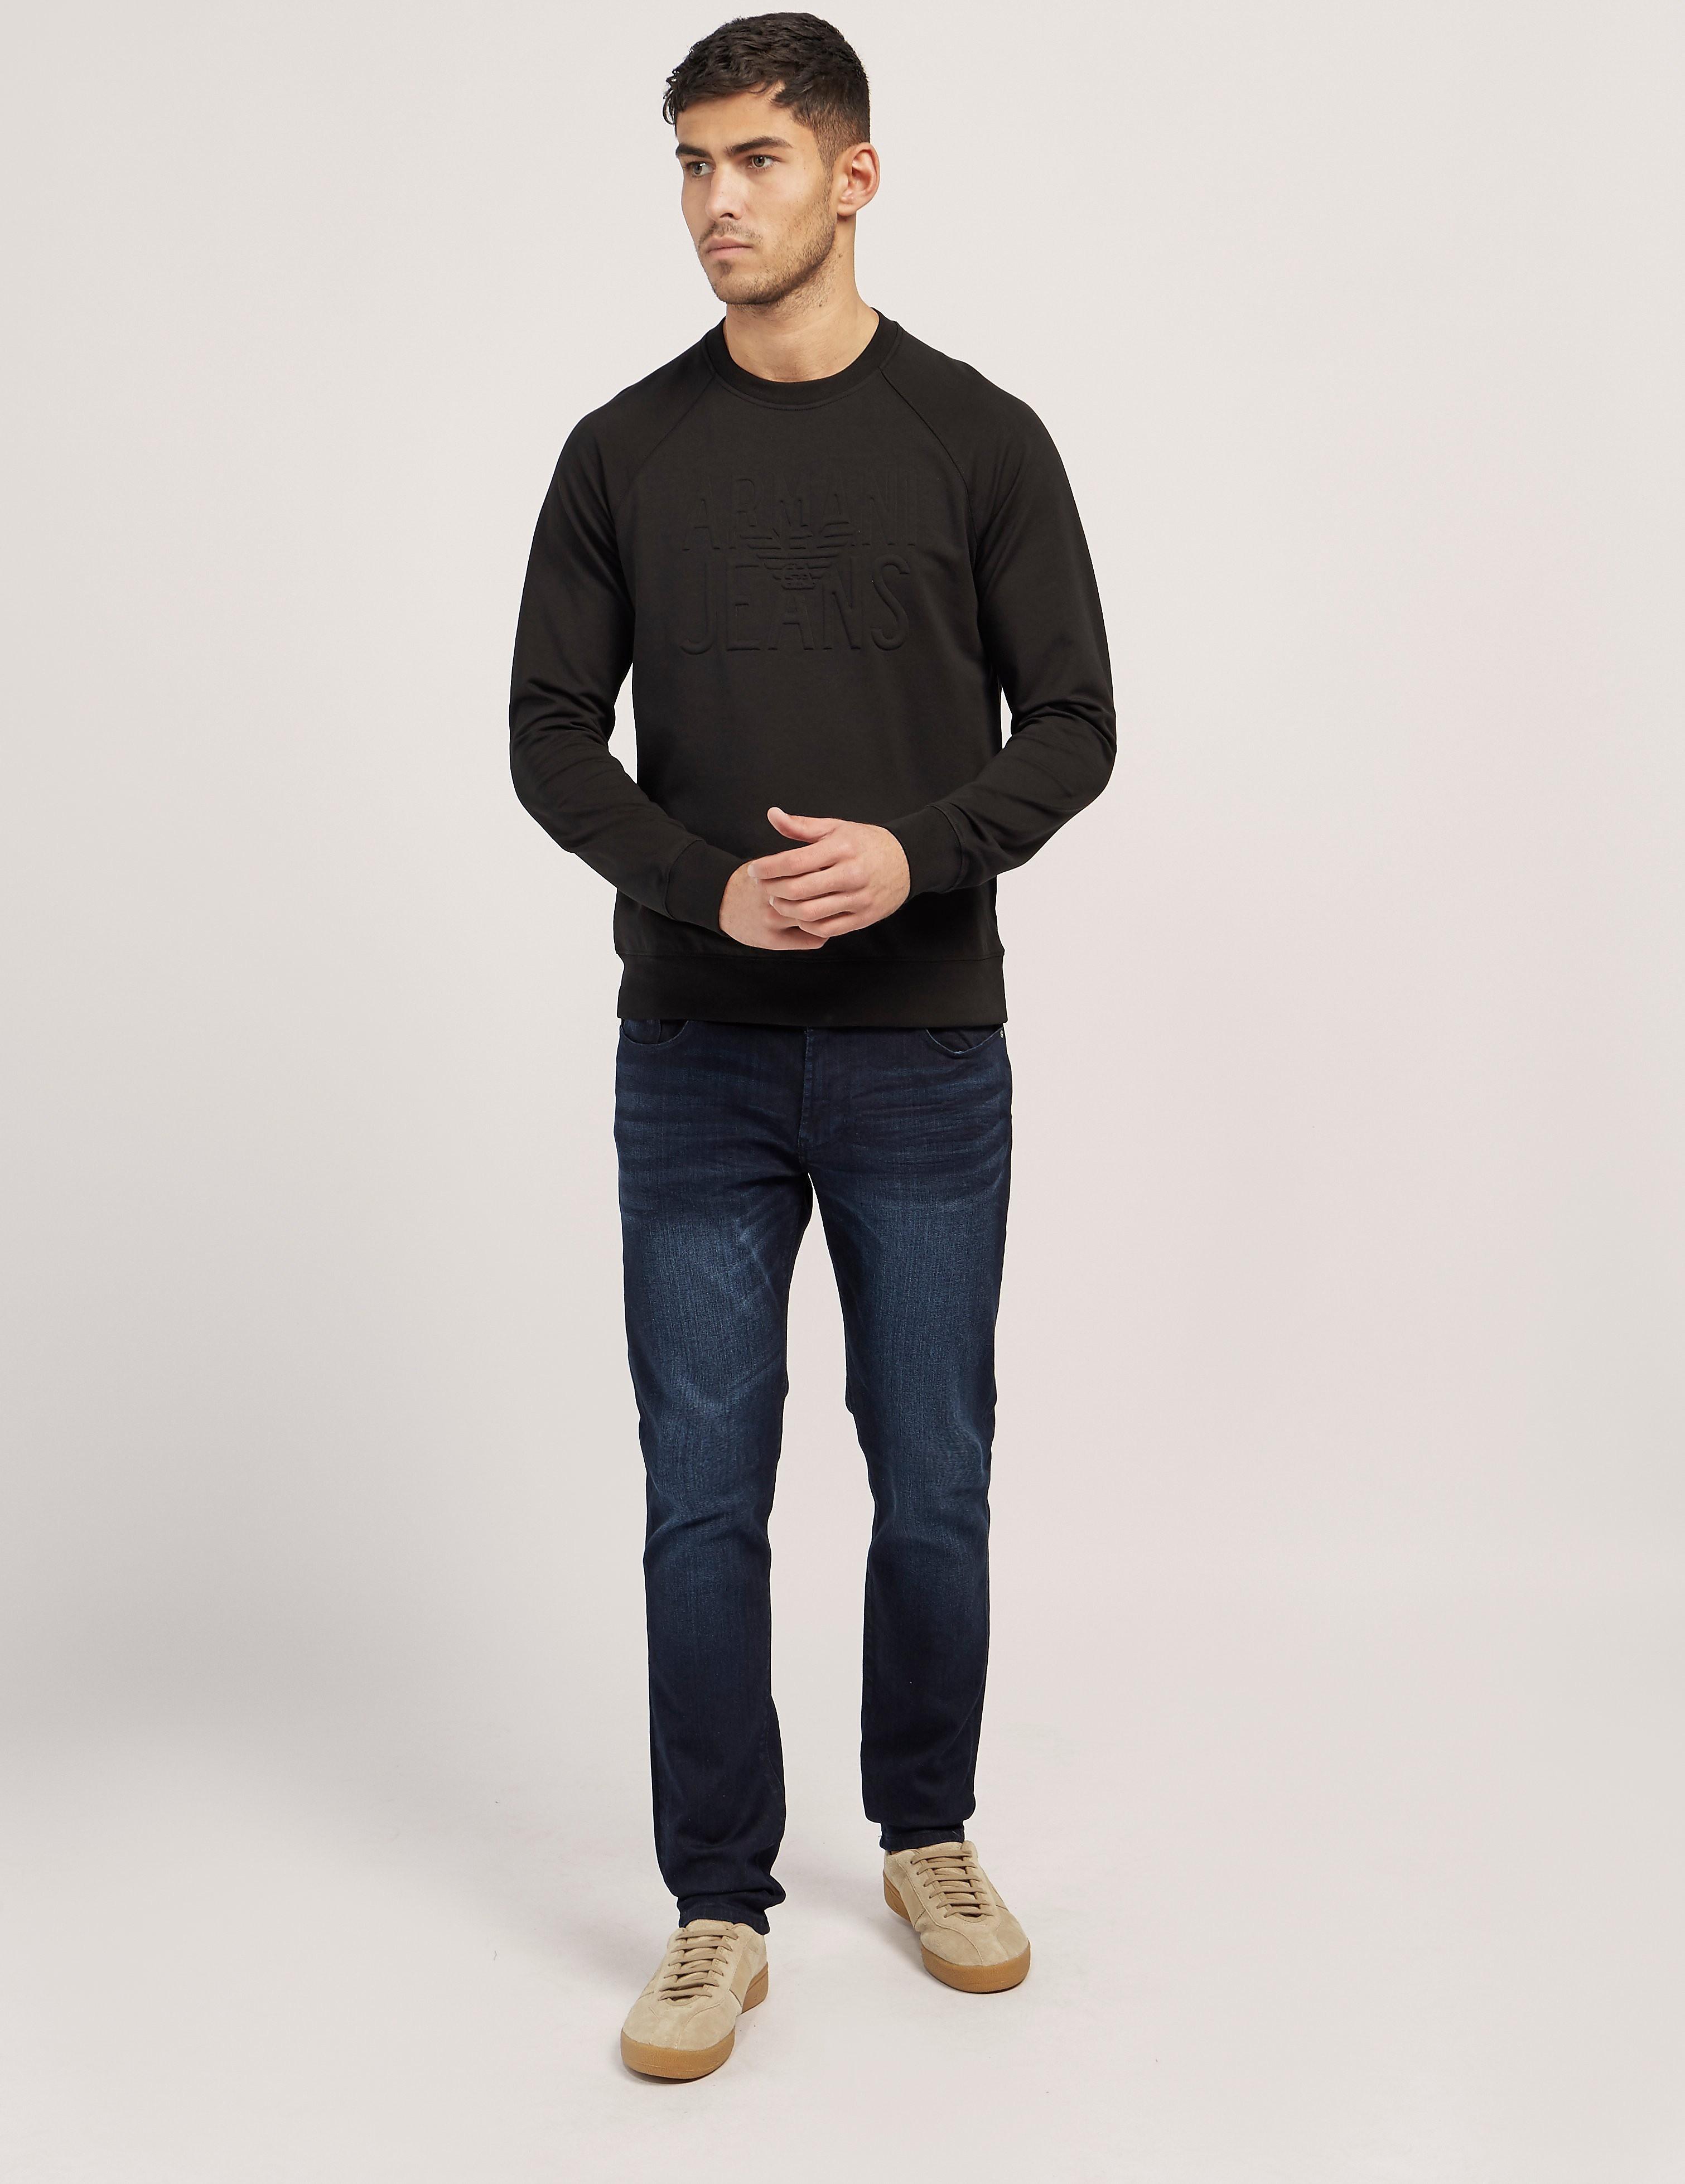 Armani Jeans Tonal Logo Sweatshirt